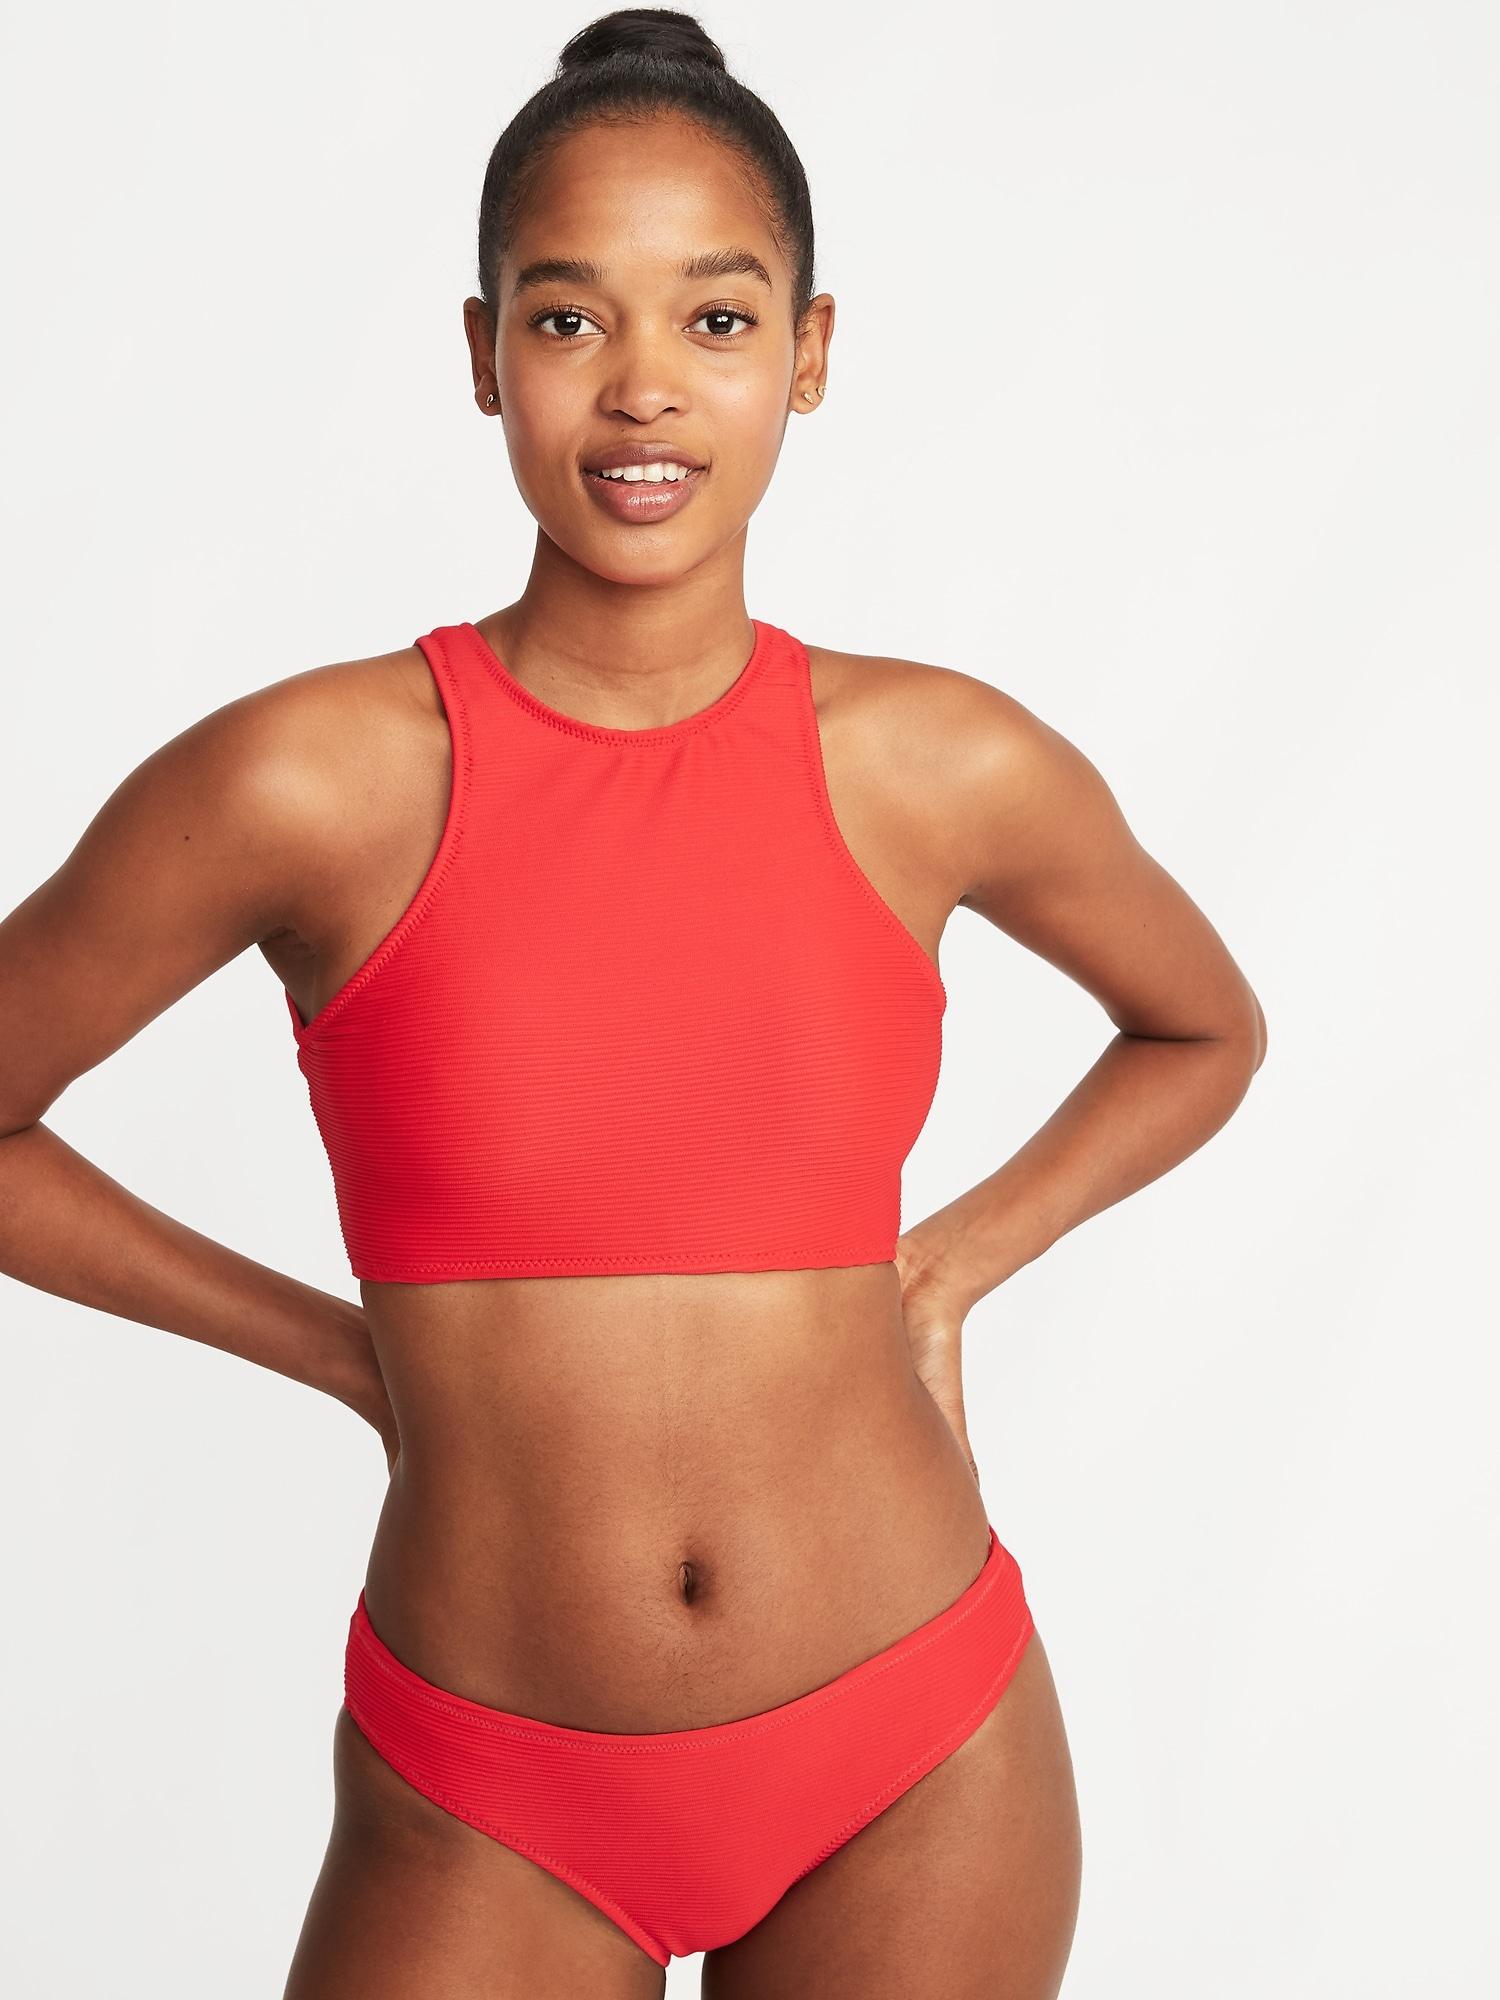 61c7152426 Textured High-Neck Swim Top for Women